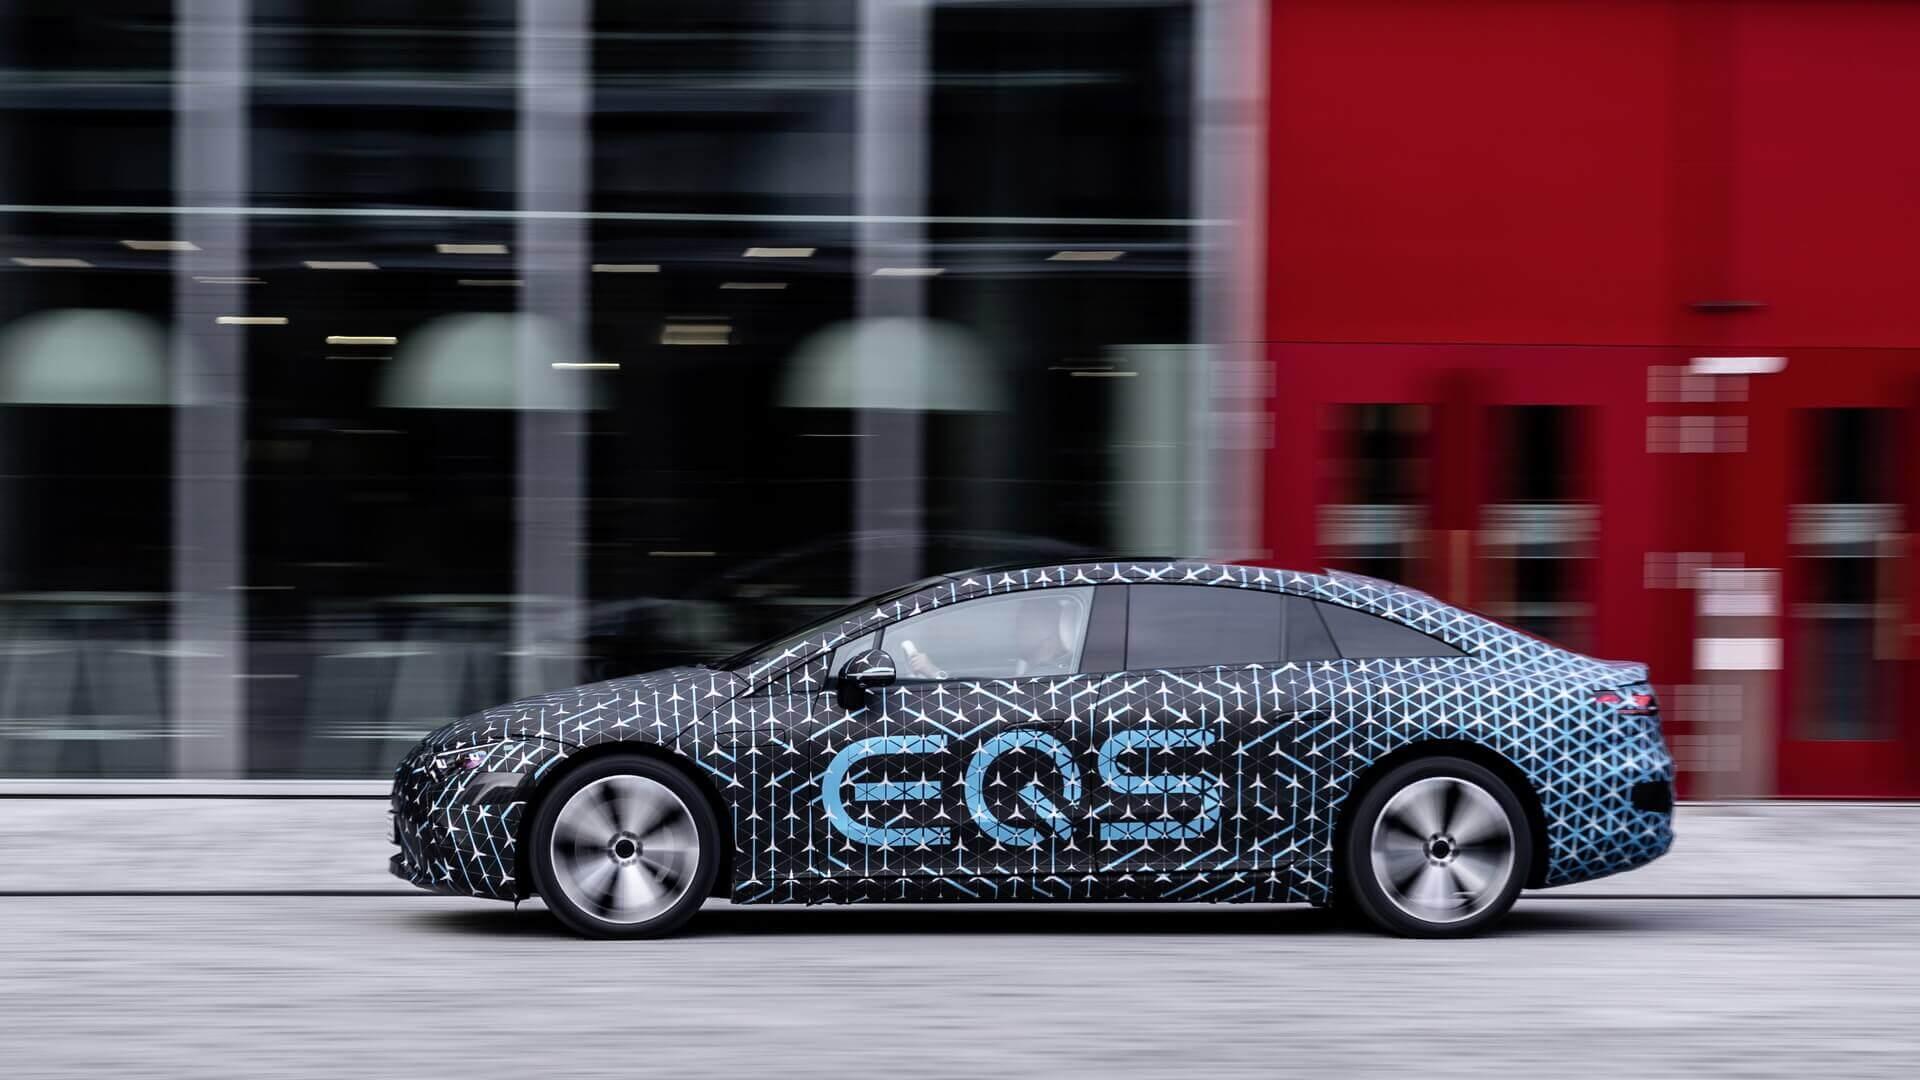 Mercedes-Benz анонсировал для седана EQS запас хода 770 км по WLTP